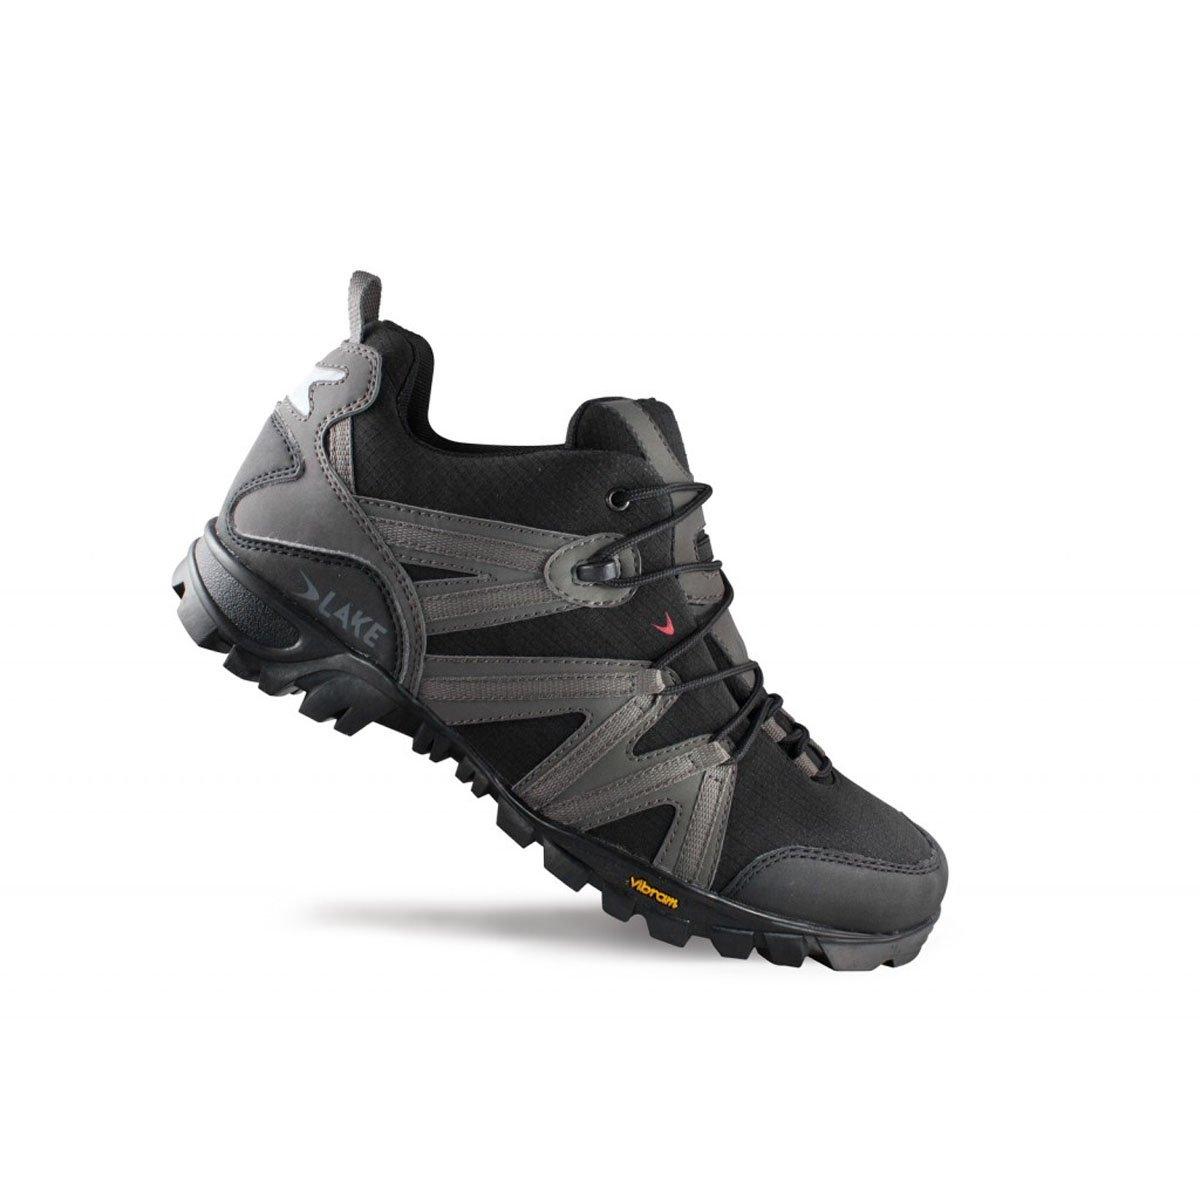 Lake MX100 Mountainbikeschuhe damen schwarz grau Größe 39 2014 MTB Schuhe